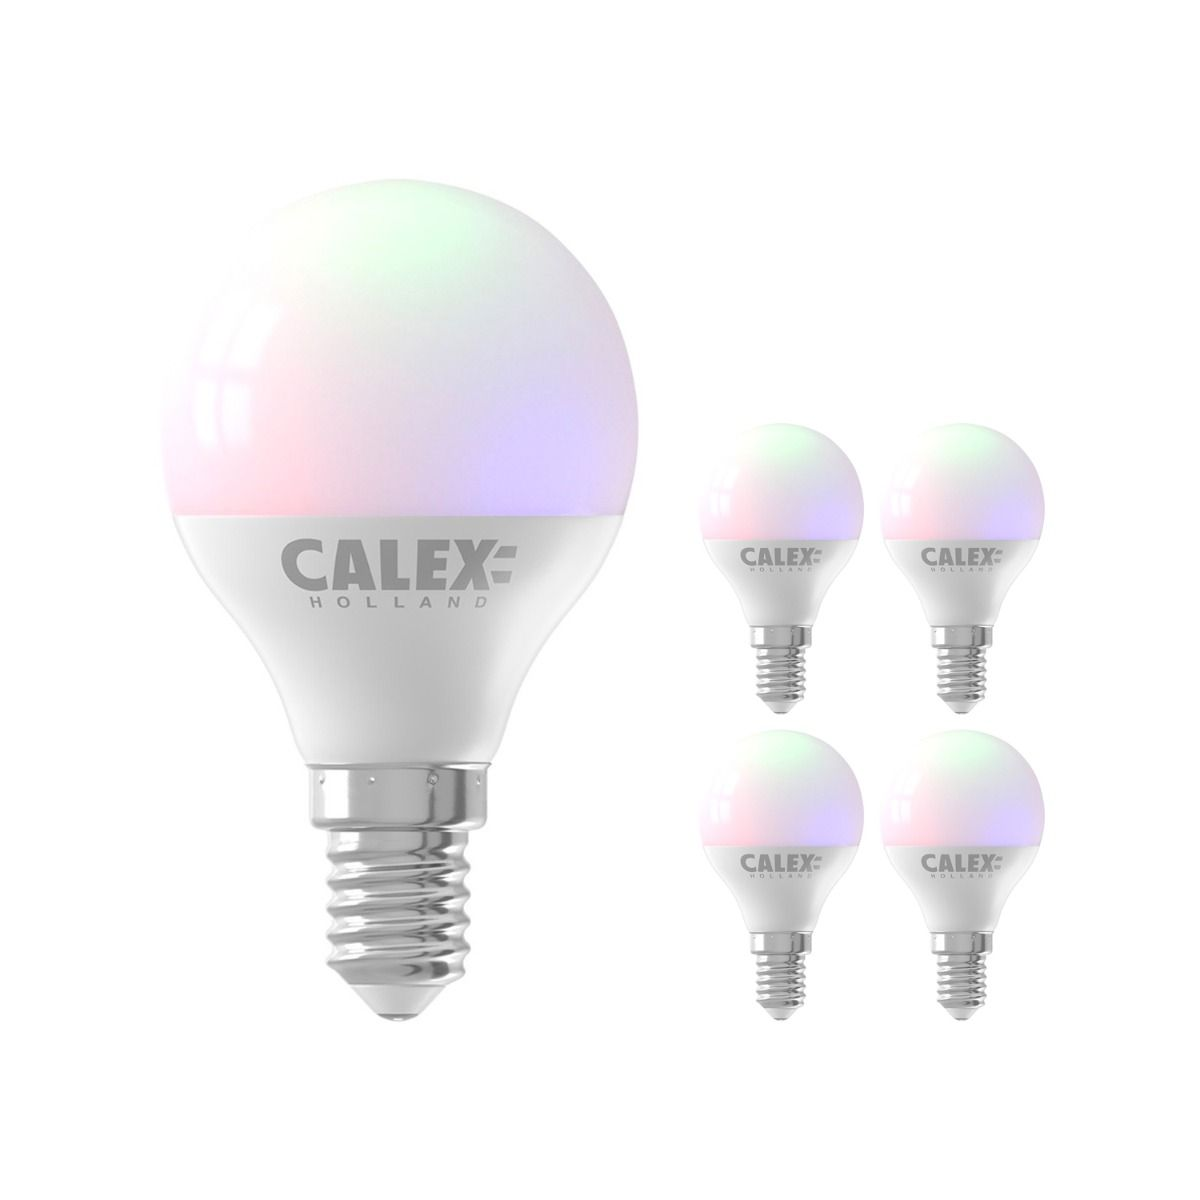 Voordeelpak 5x Calex Smart Kogelvormig LED Lamp E14 5W 470lm 2200-4000K | Tuya Wifi - Color Ambiance + Afstembaar Wit